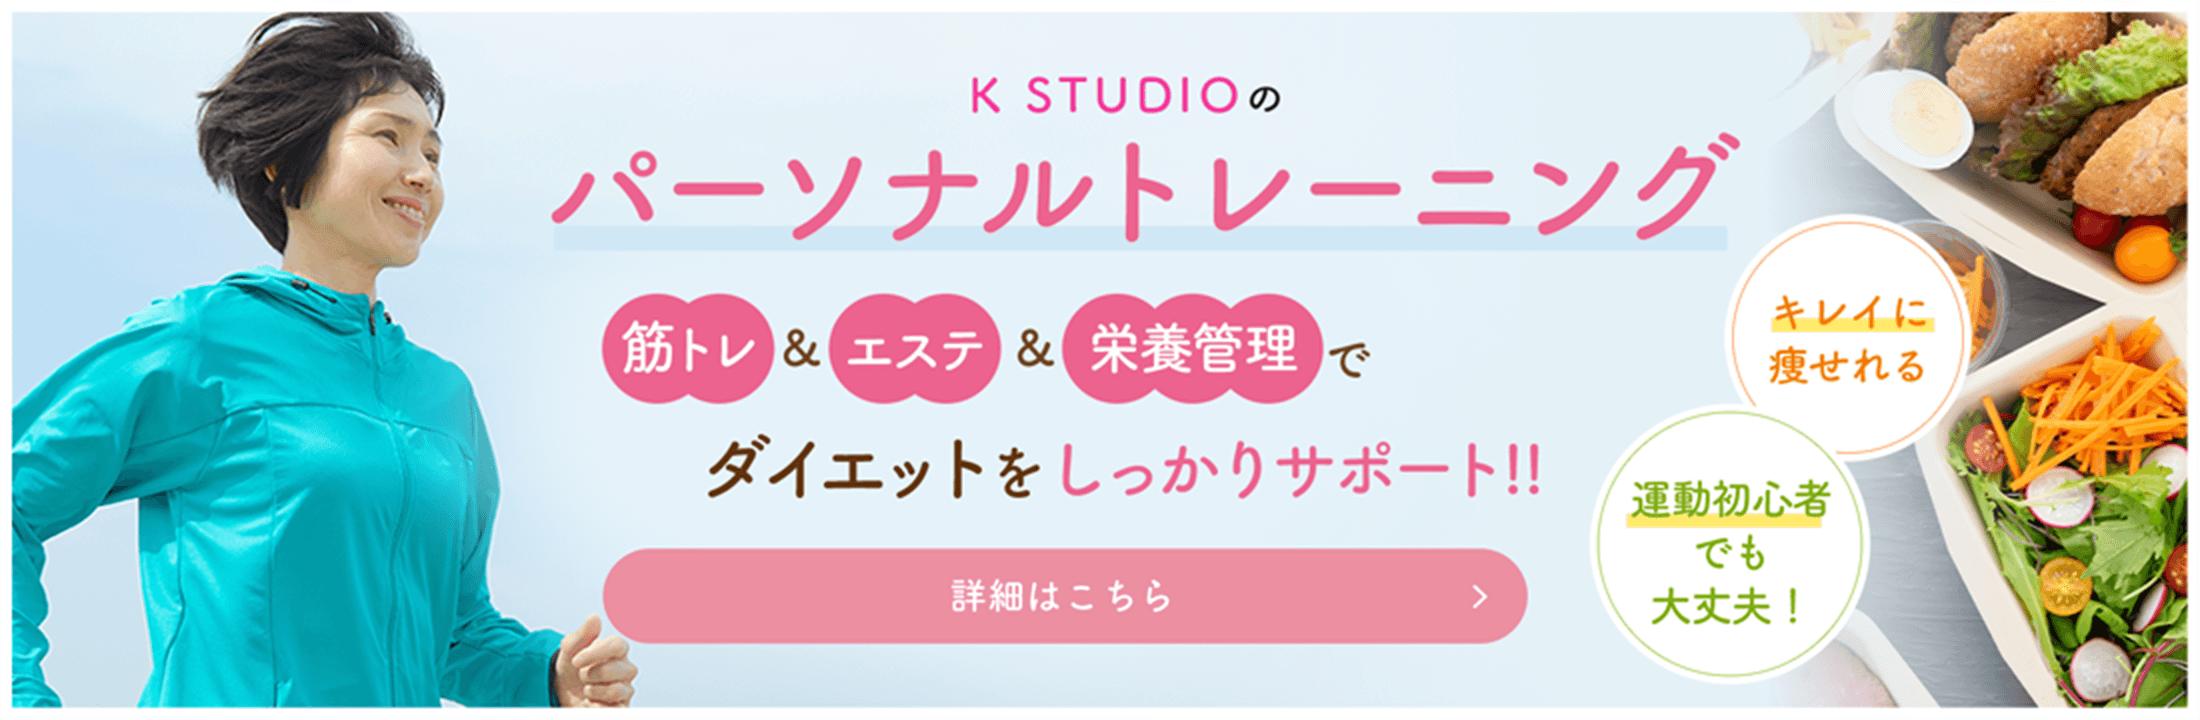 k-studioのパーソナルトレーニング